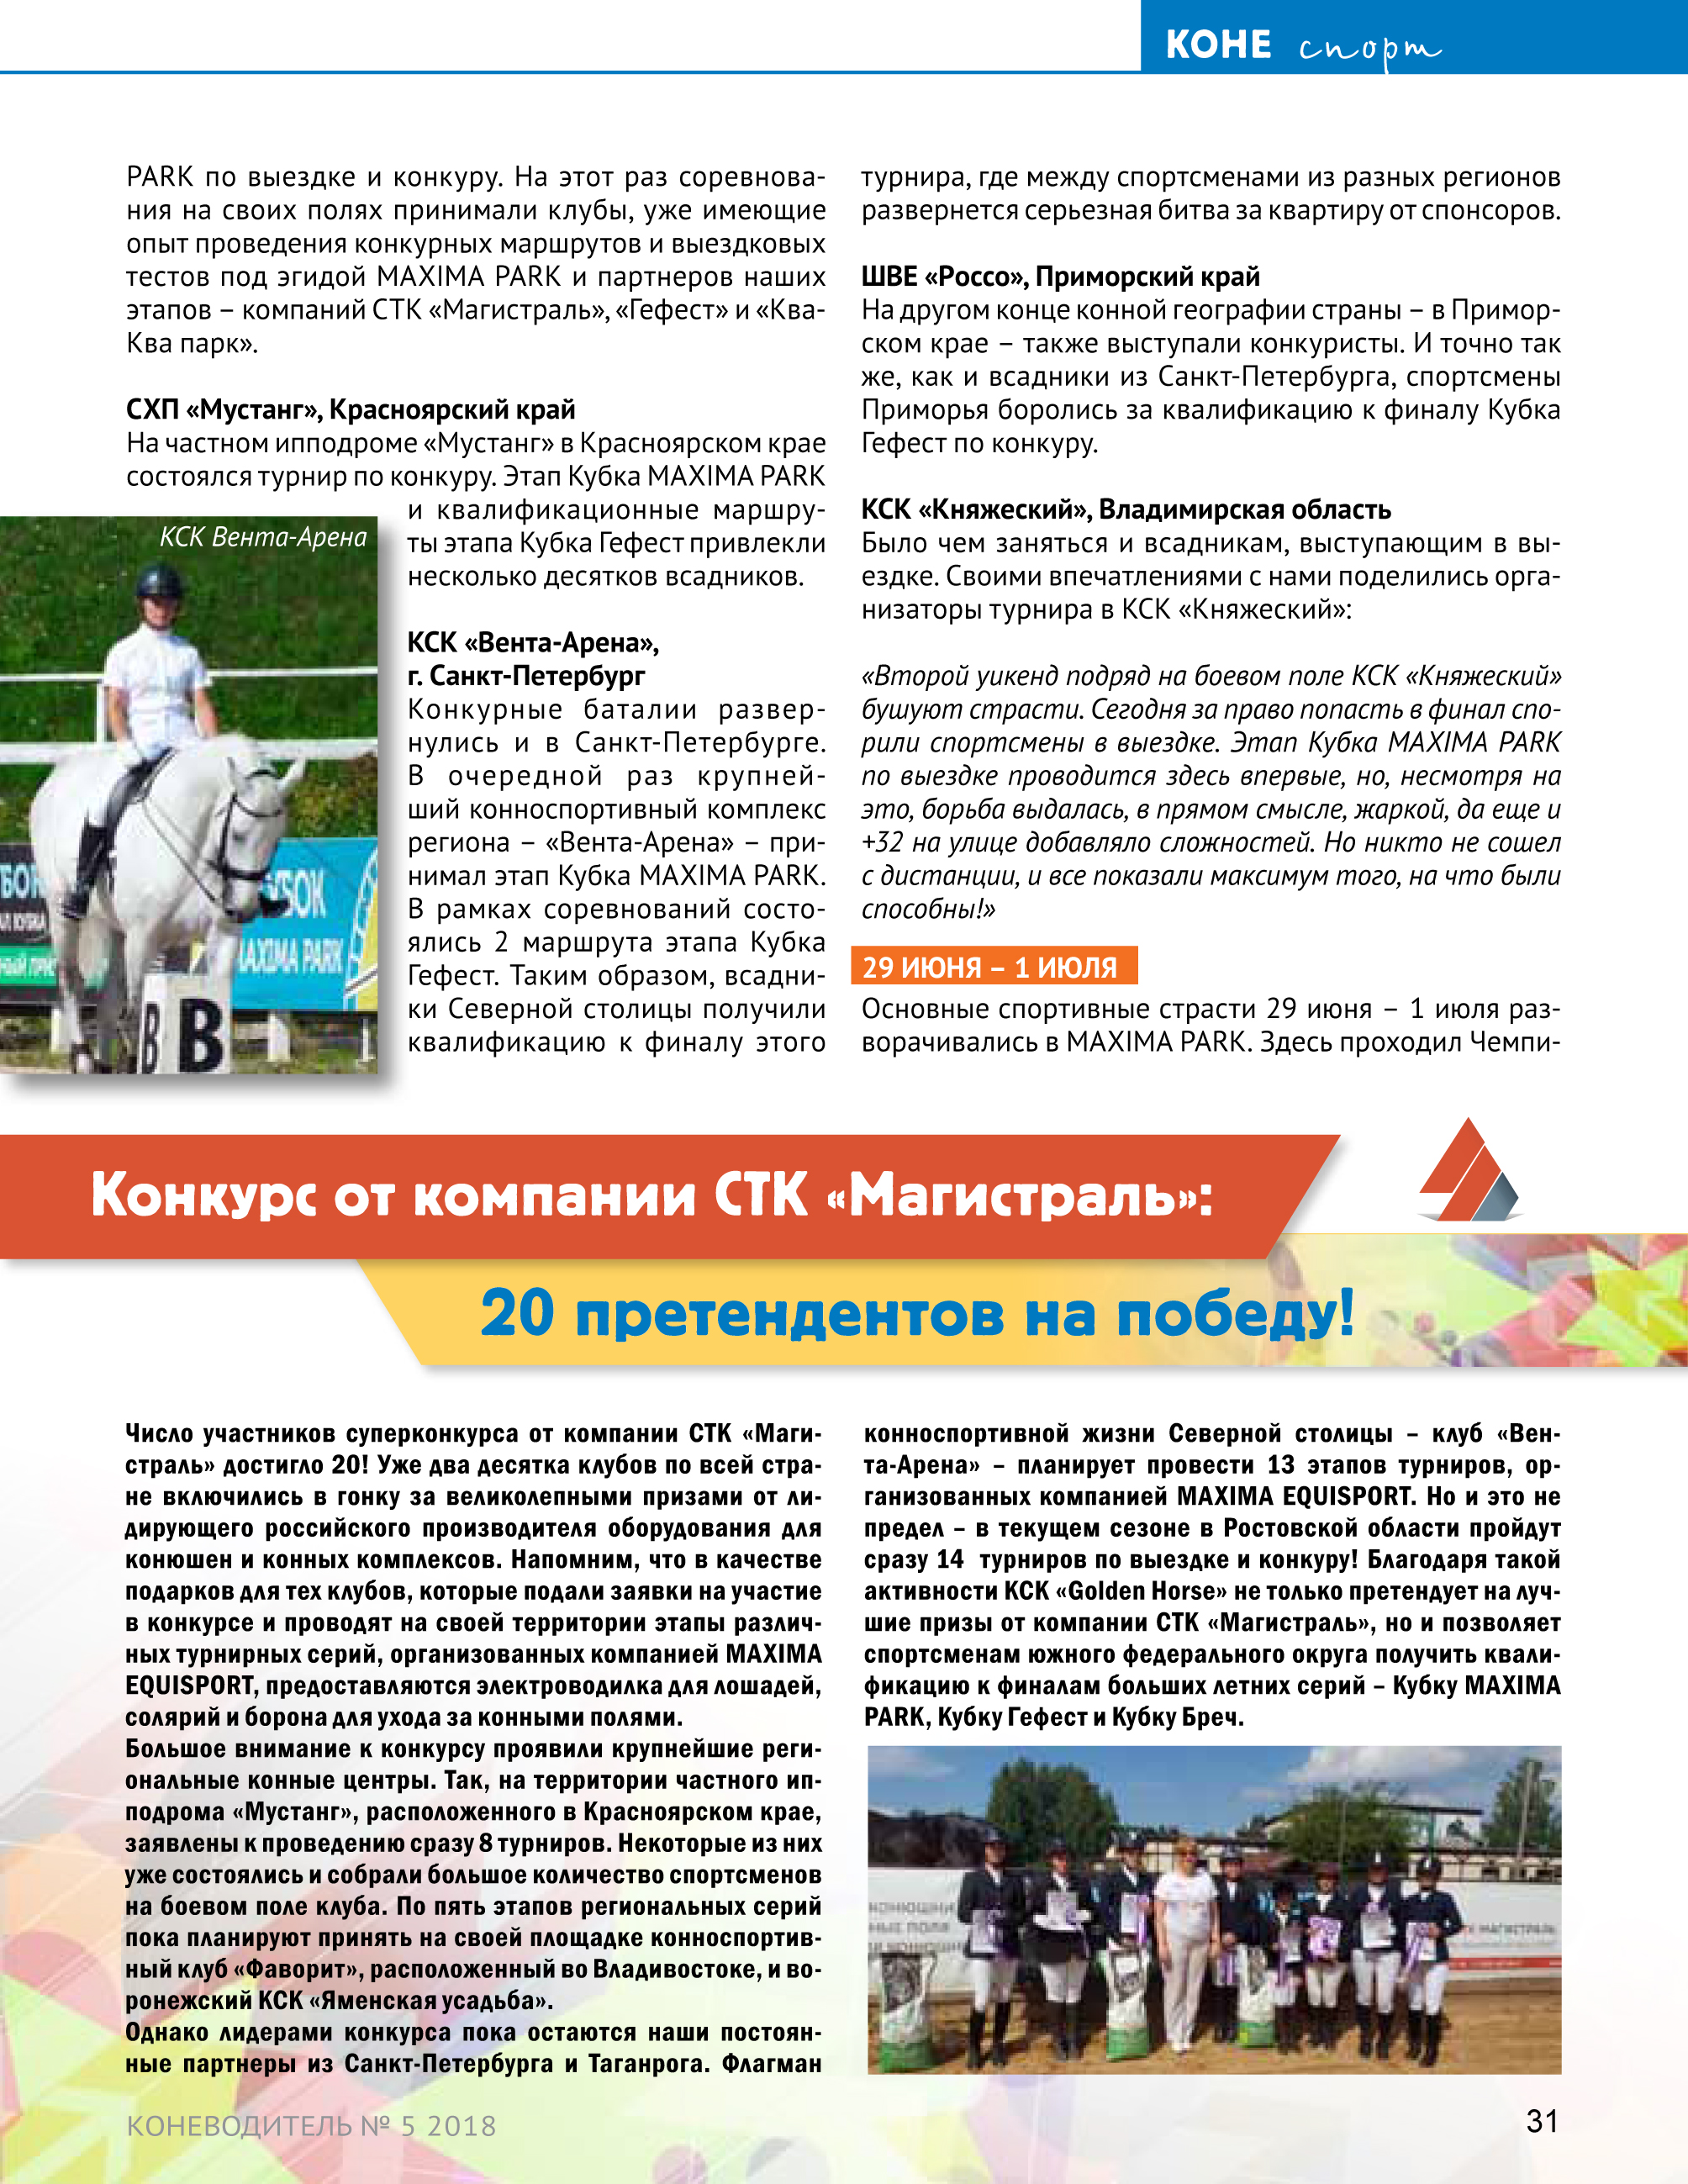 Book 5 2018 ДЛЯ САЙТА-31